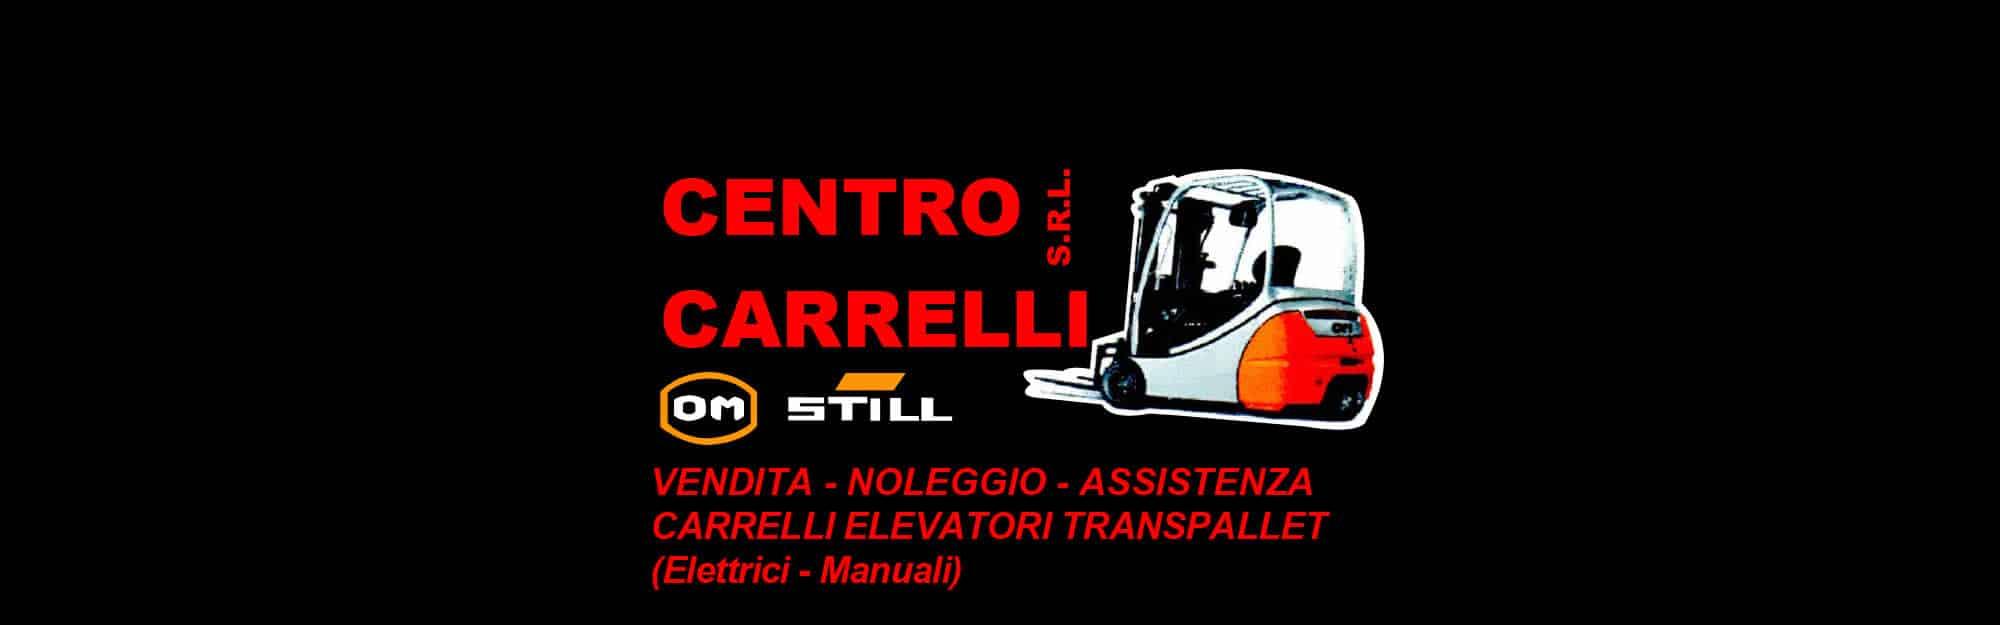 centro-carrelli-slide1